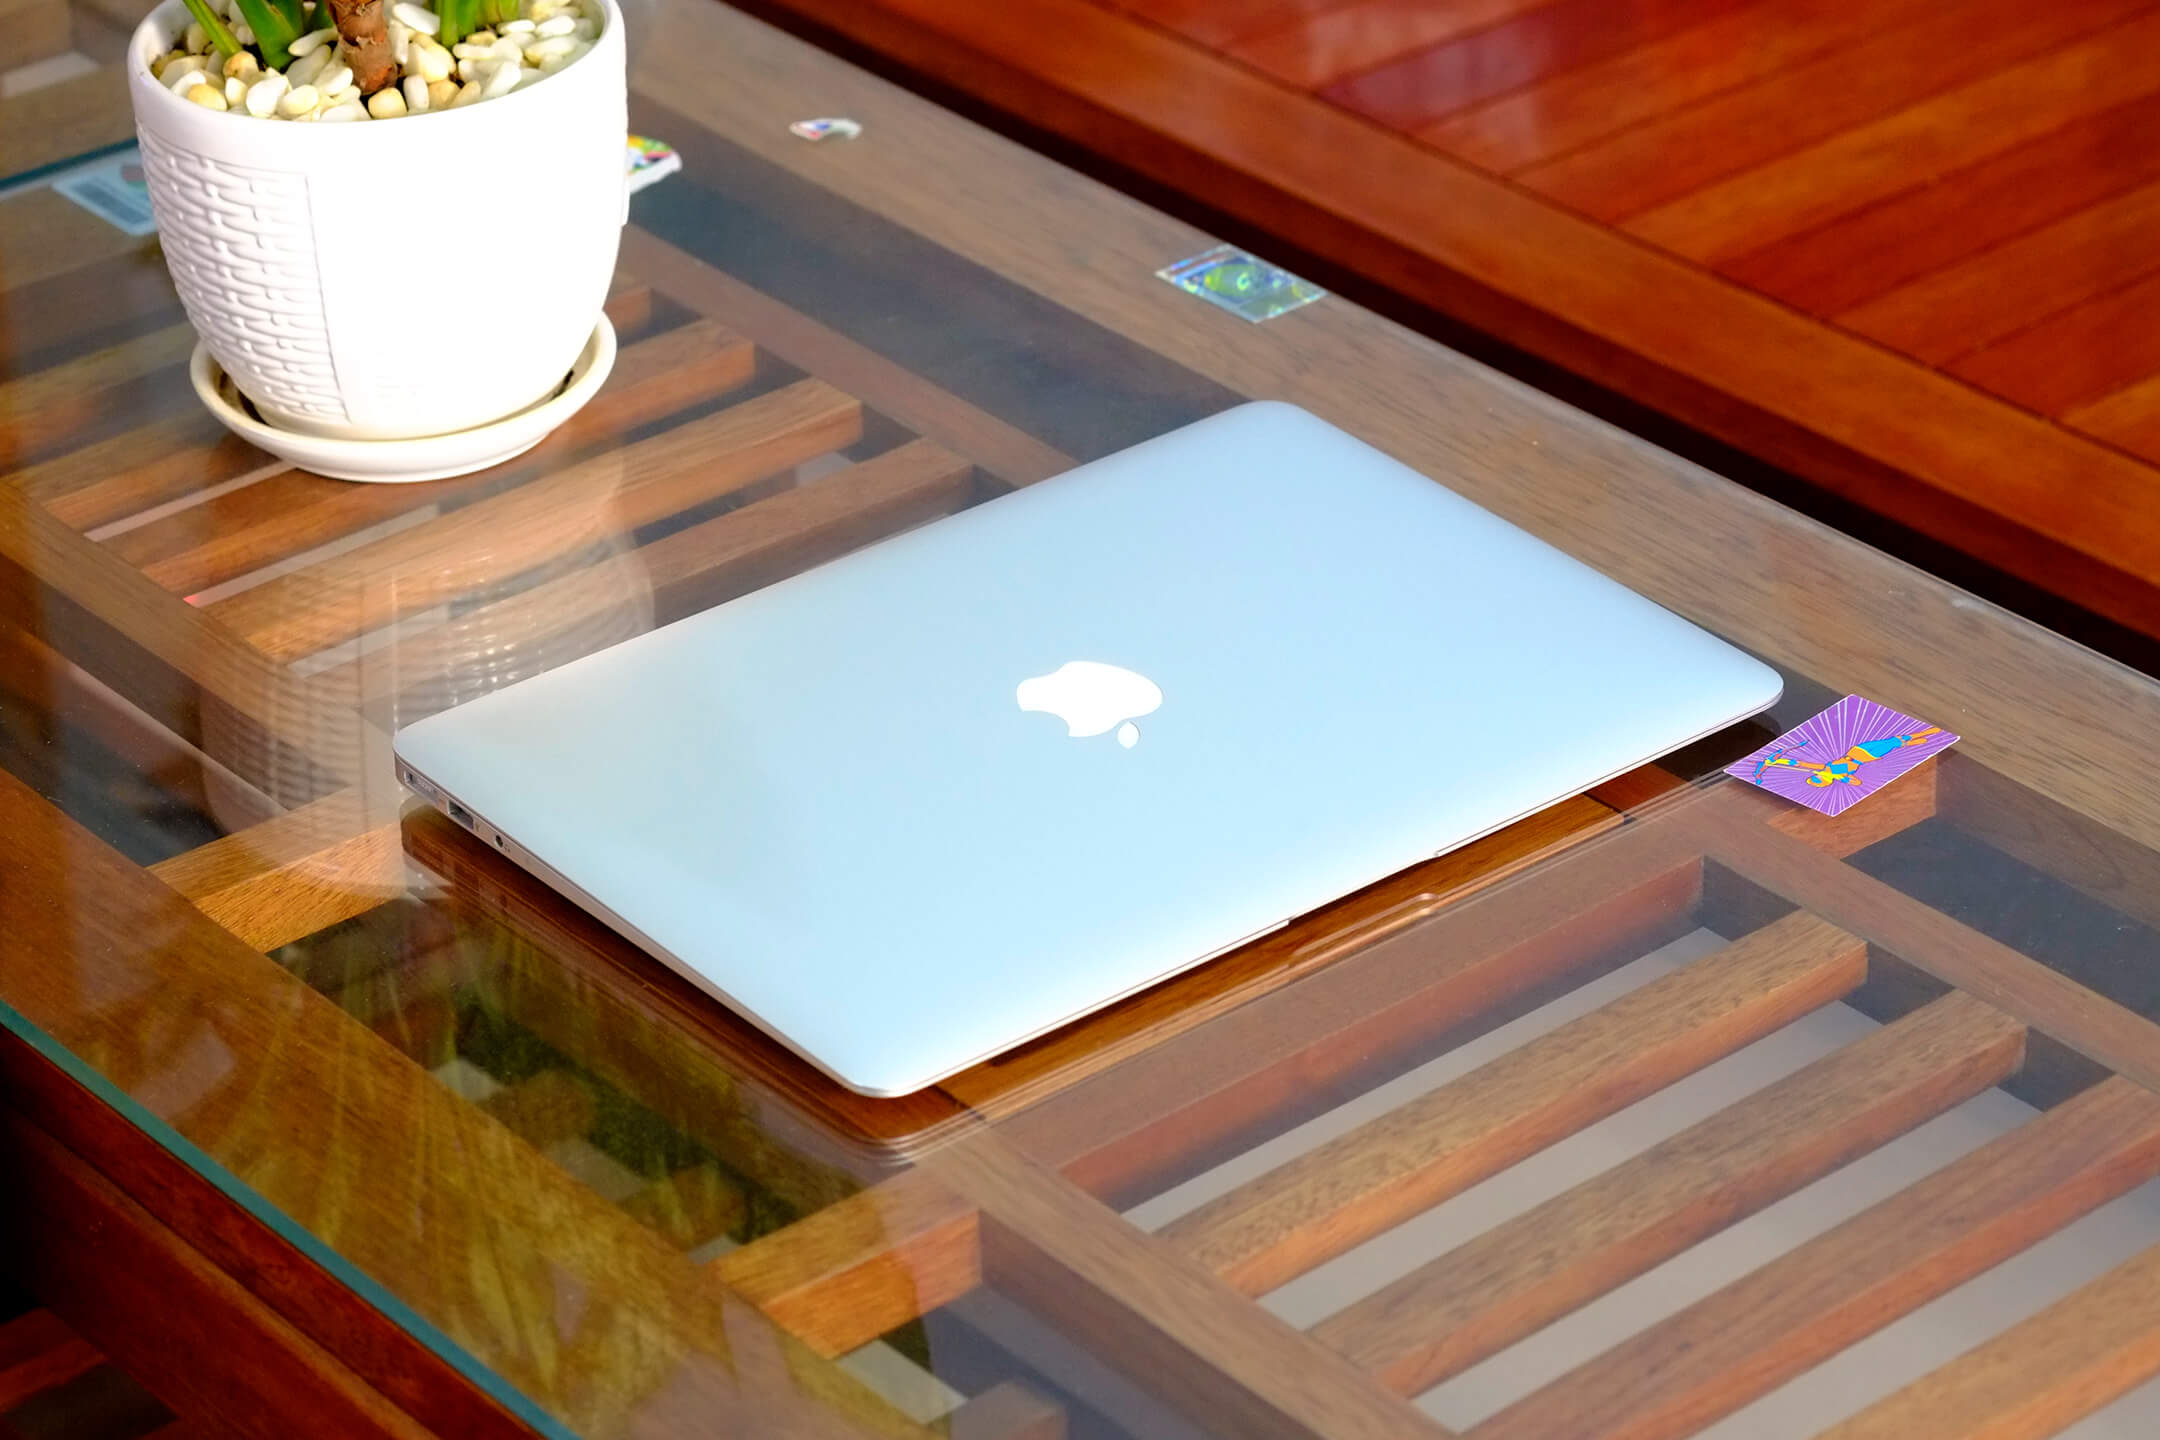 Macbook Air 13-inch 2012 MD232 Option Core i7 / 8GB / 256GB / New 98%